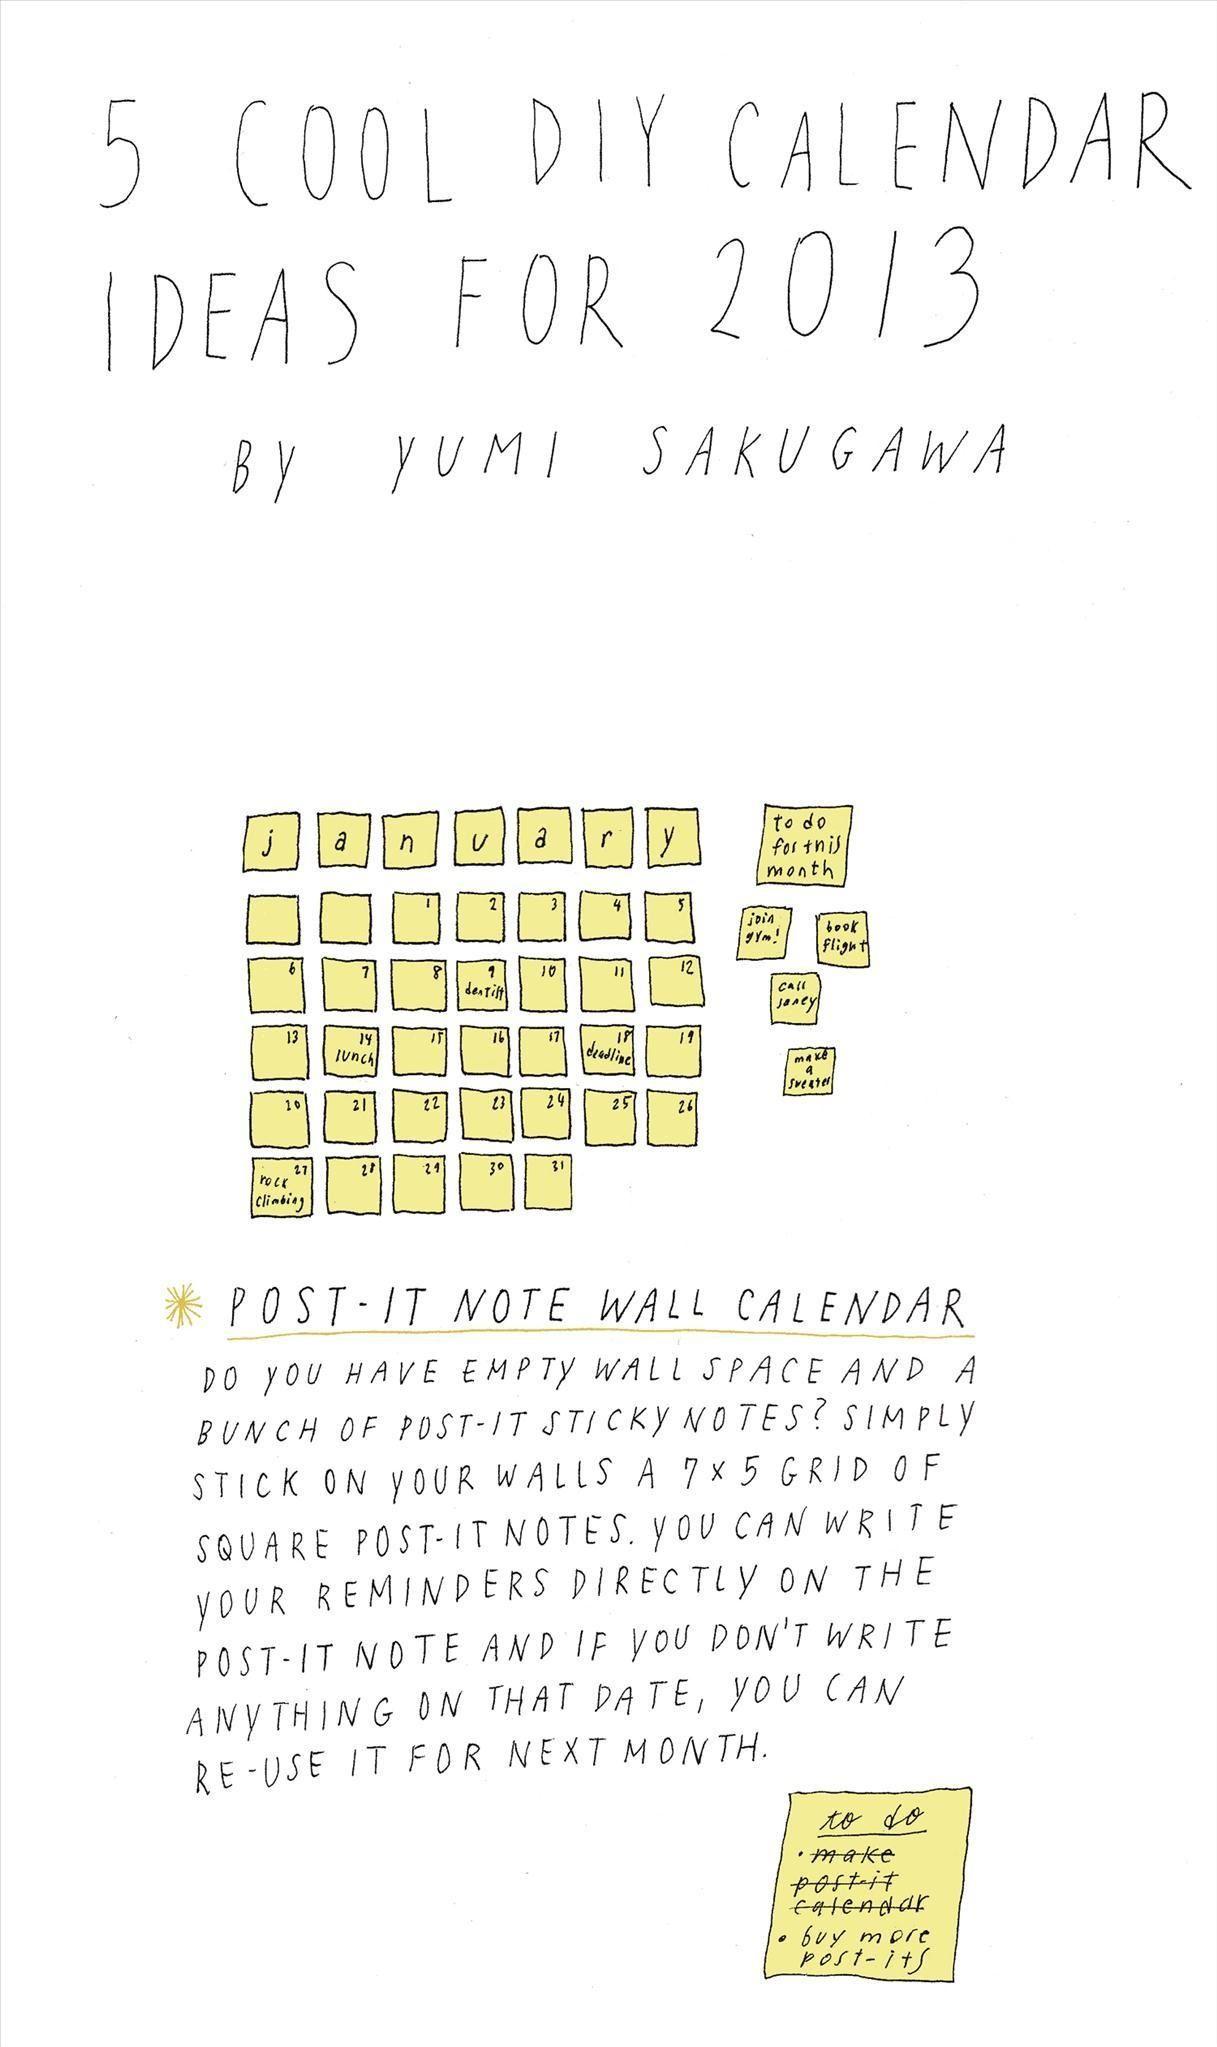 Diy Google Calendar : Cool diy calendar ideas for « the secret yumiverse